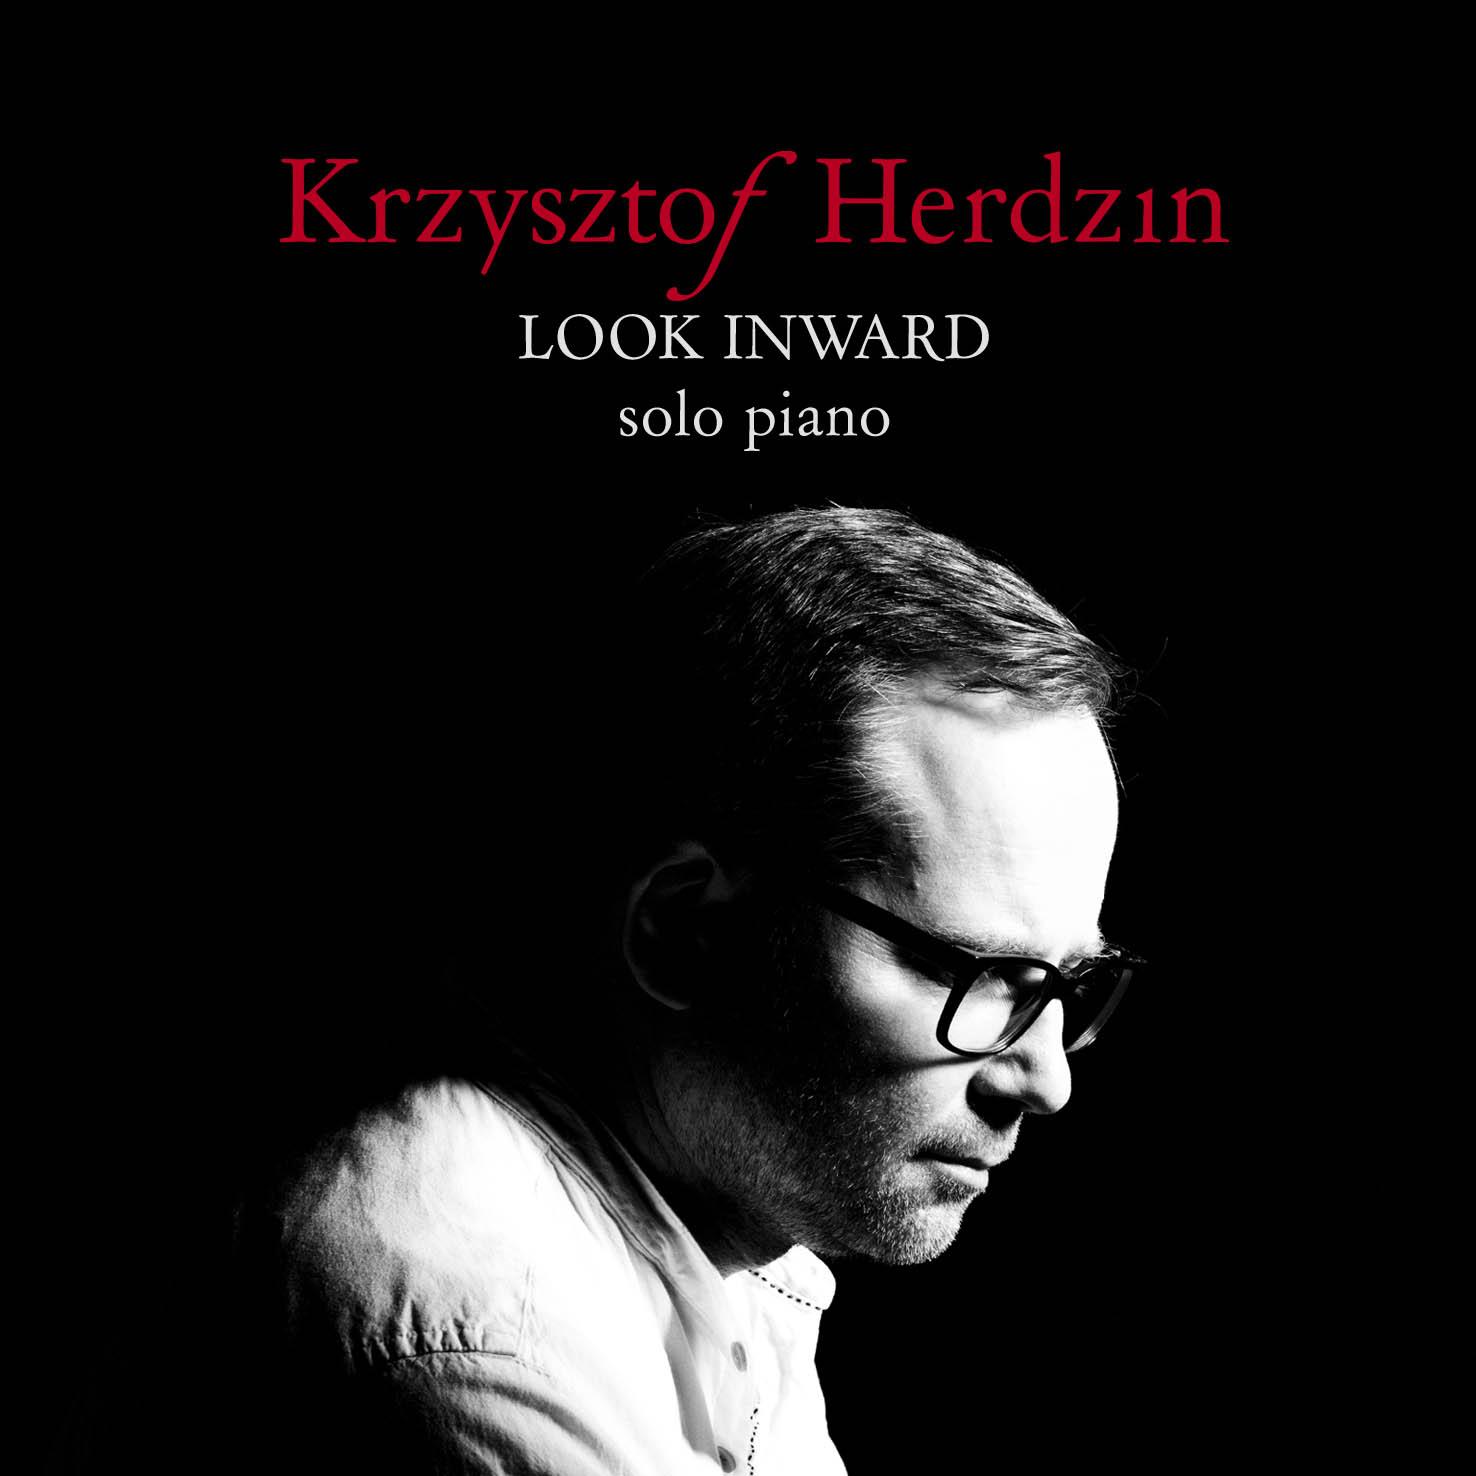 Look Inward. Solo Piano by Krzysztof Herdzin-okladka